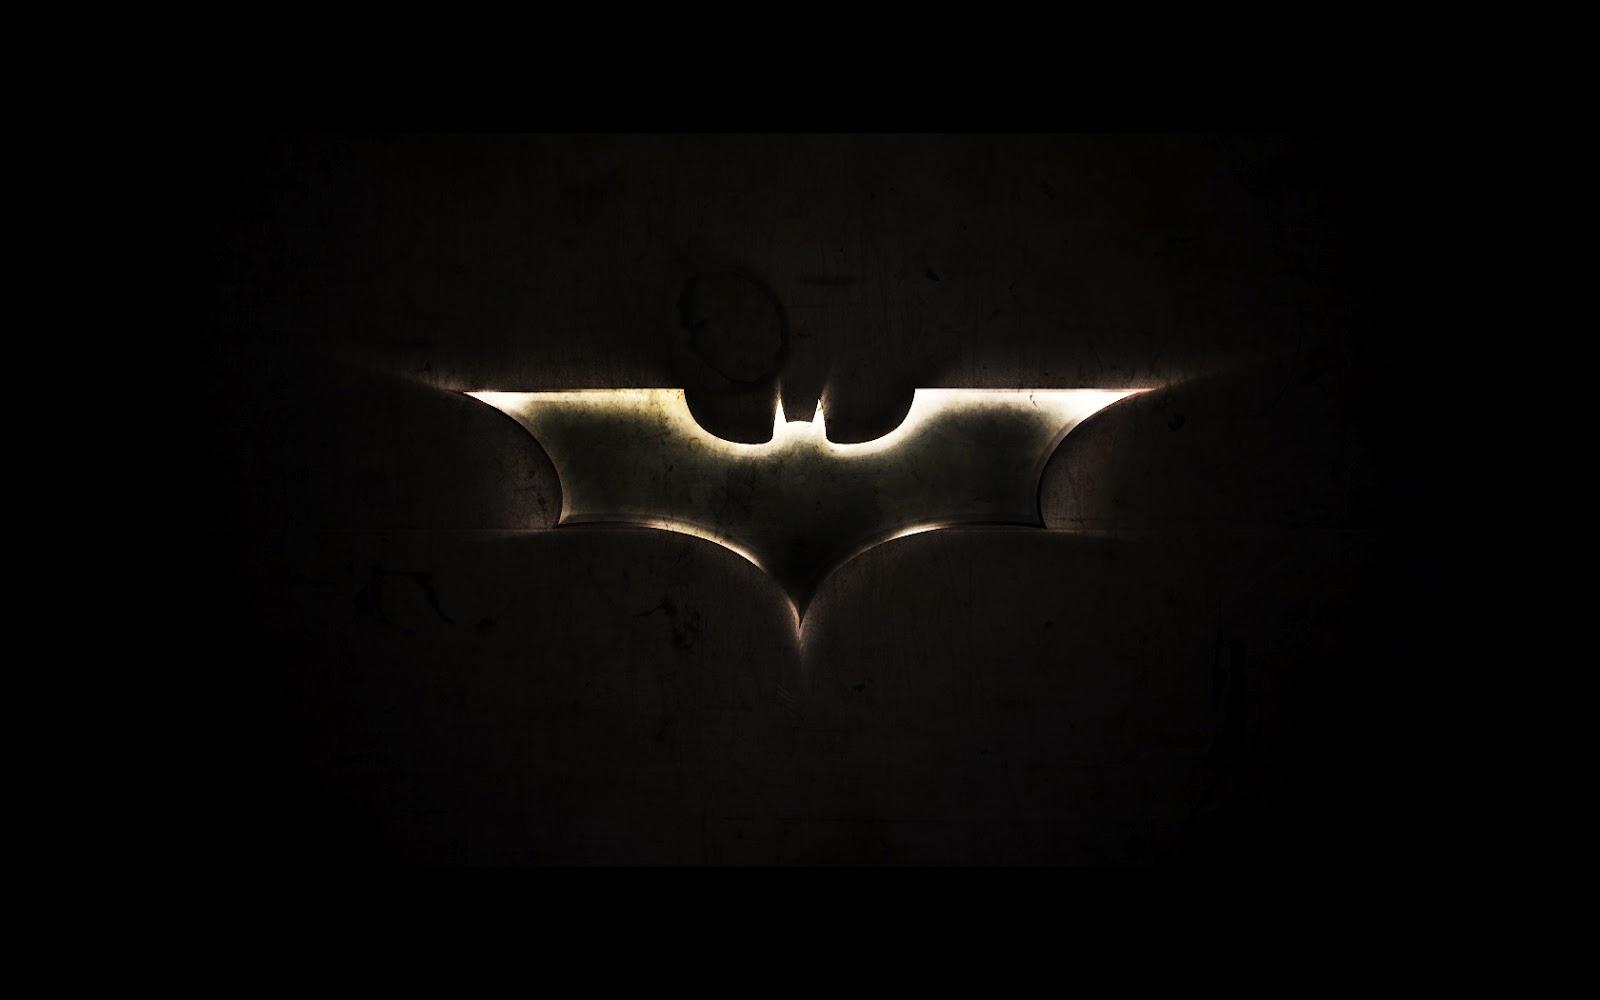 http://1.bp.blogspot.com/-ea59XgsLh1k/UCPPSWR8NCI/AAAAAAAABtc/k5D6PqGLxUU/s1600/the-dark-knight-batman-symbol-batman-3.jpg